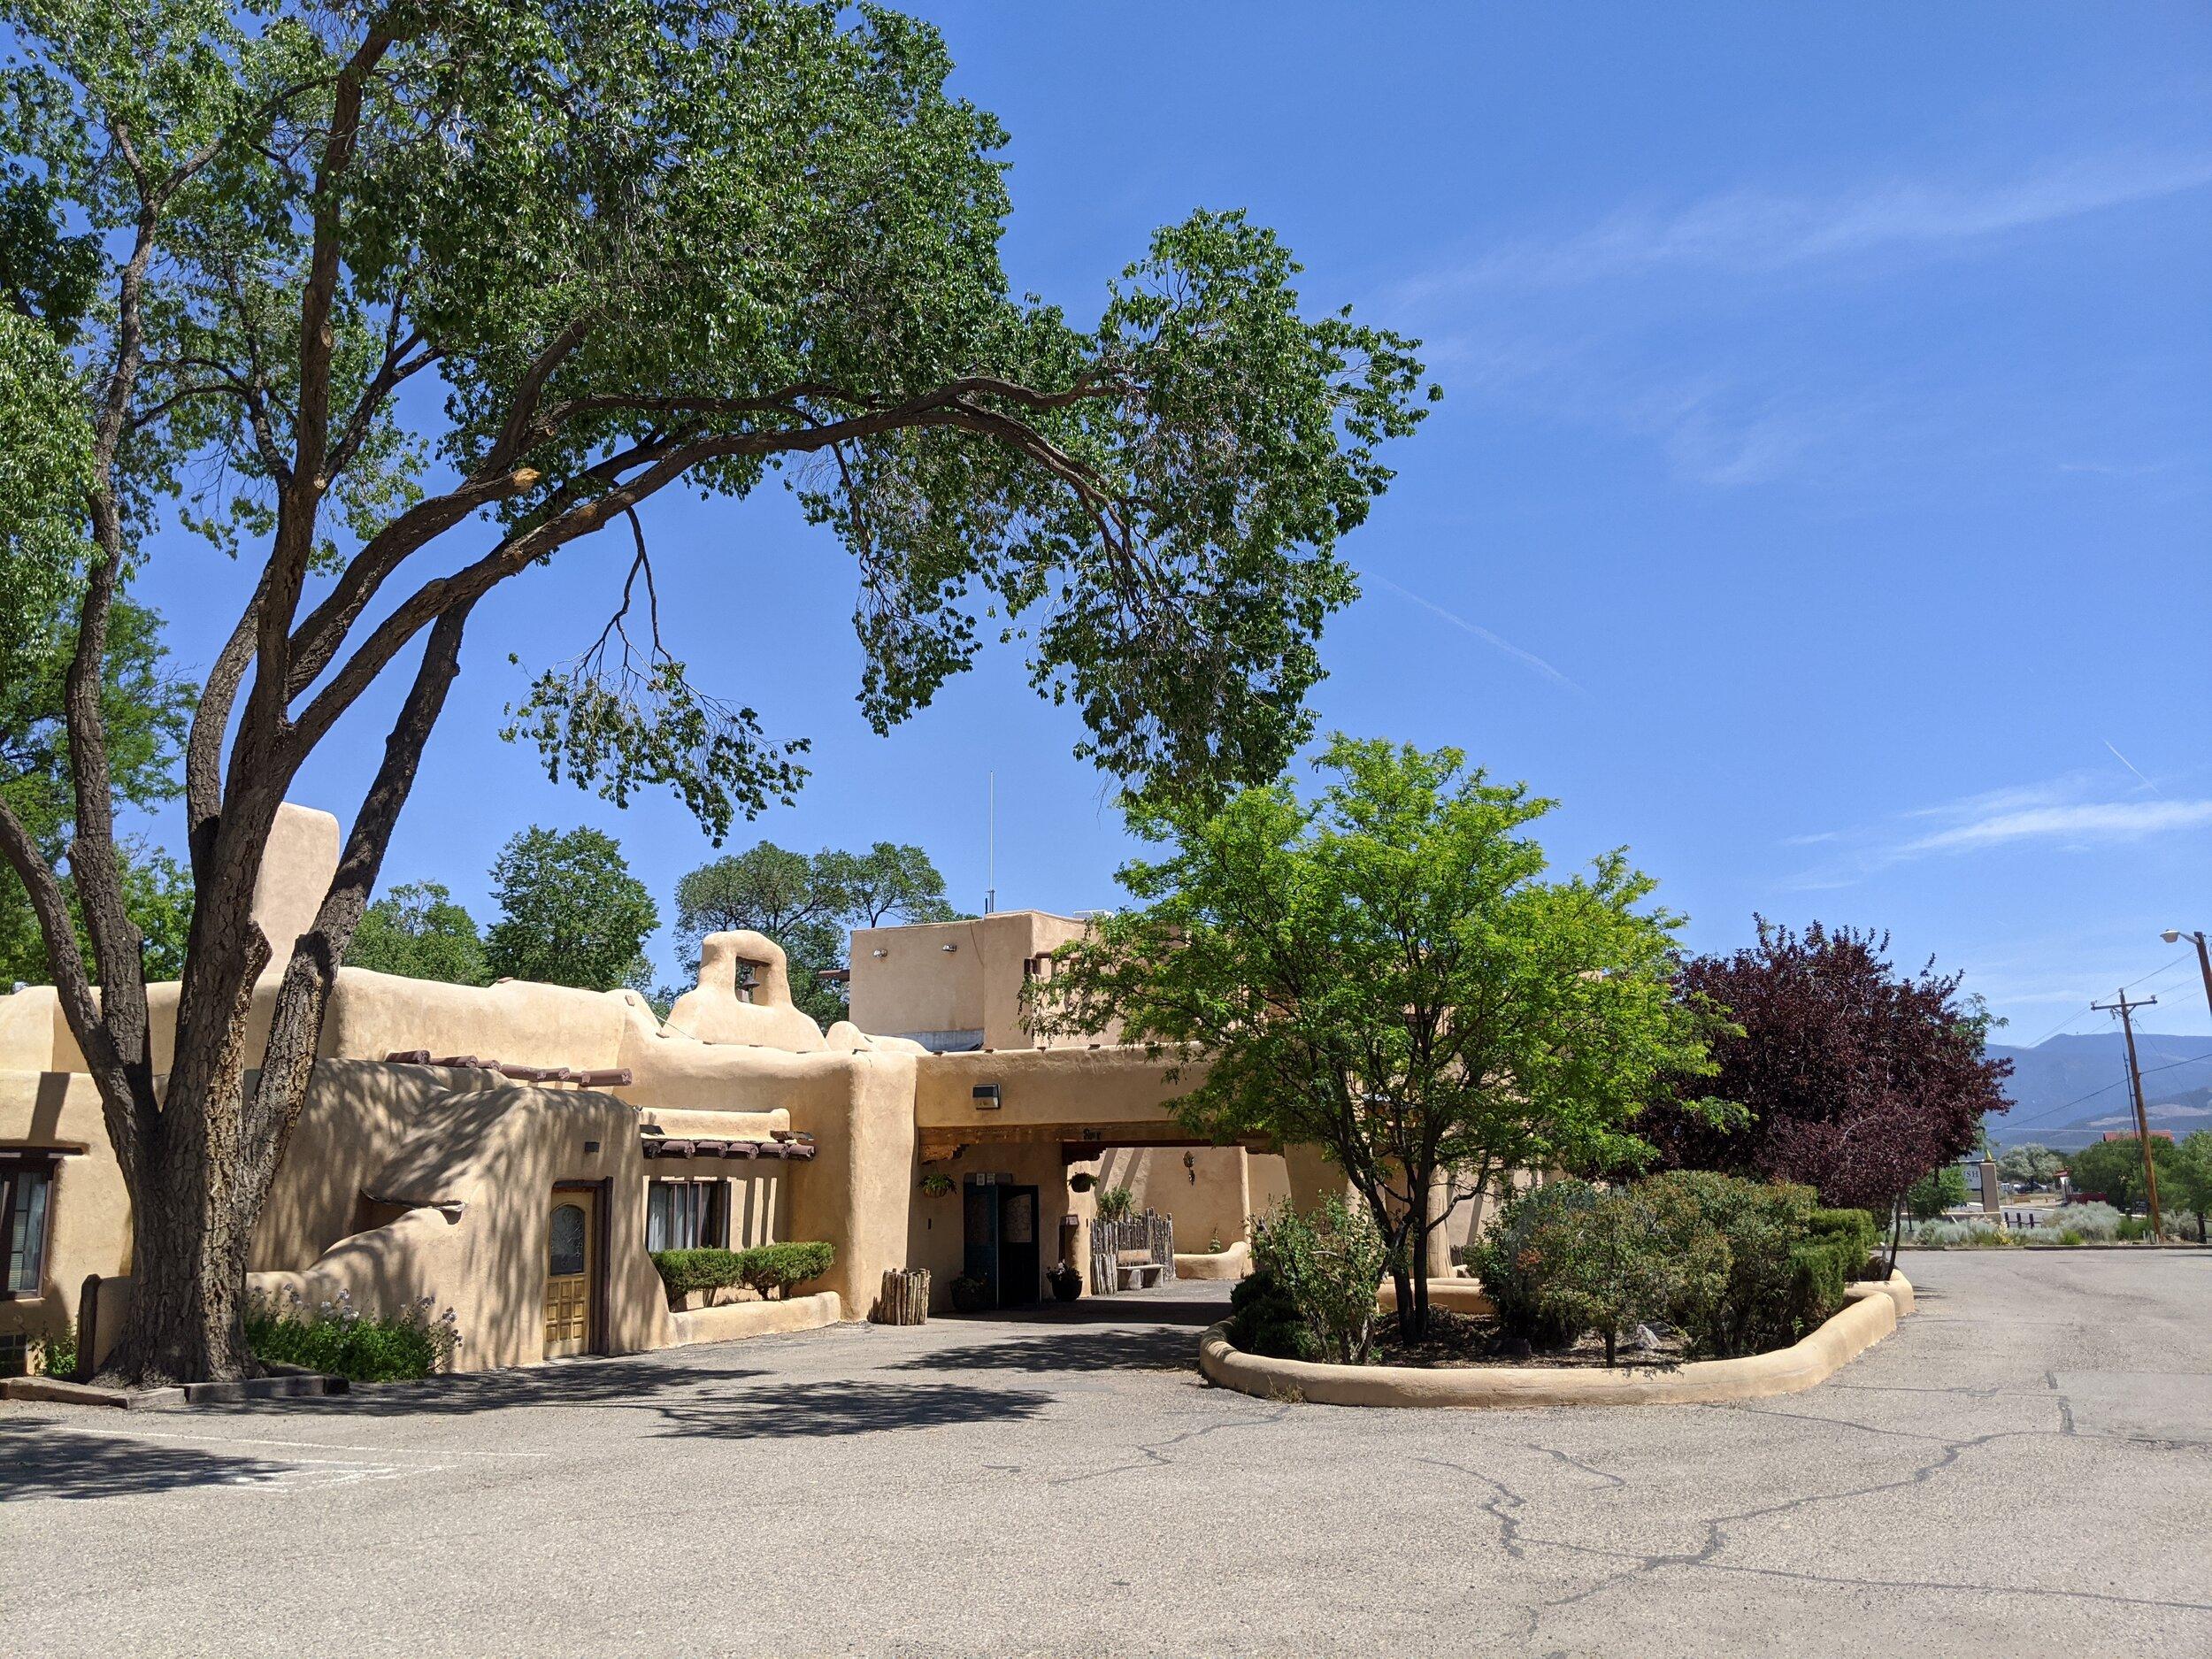 10 Best Hotels in Tombstone